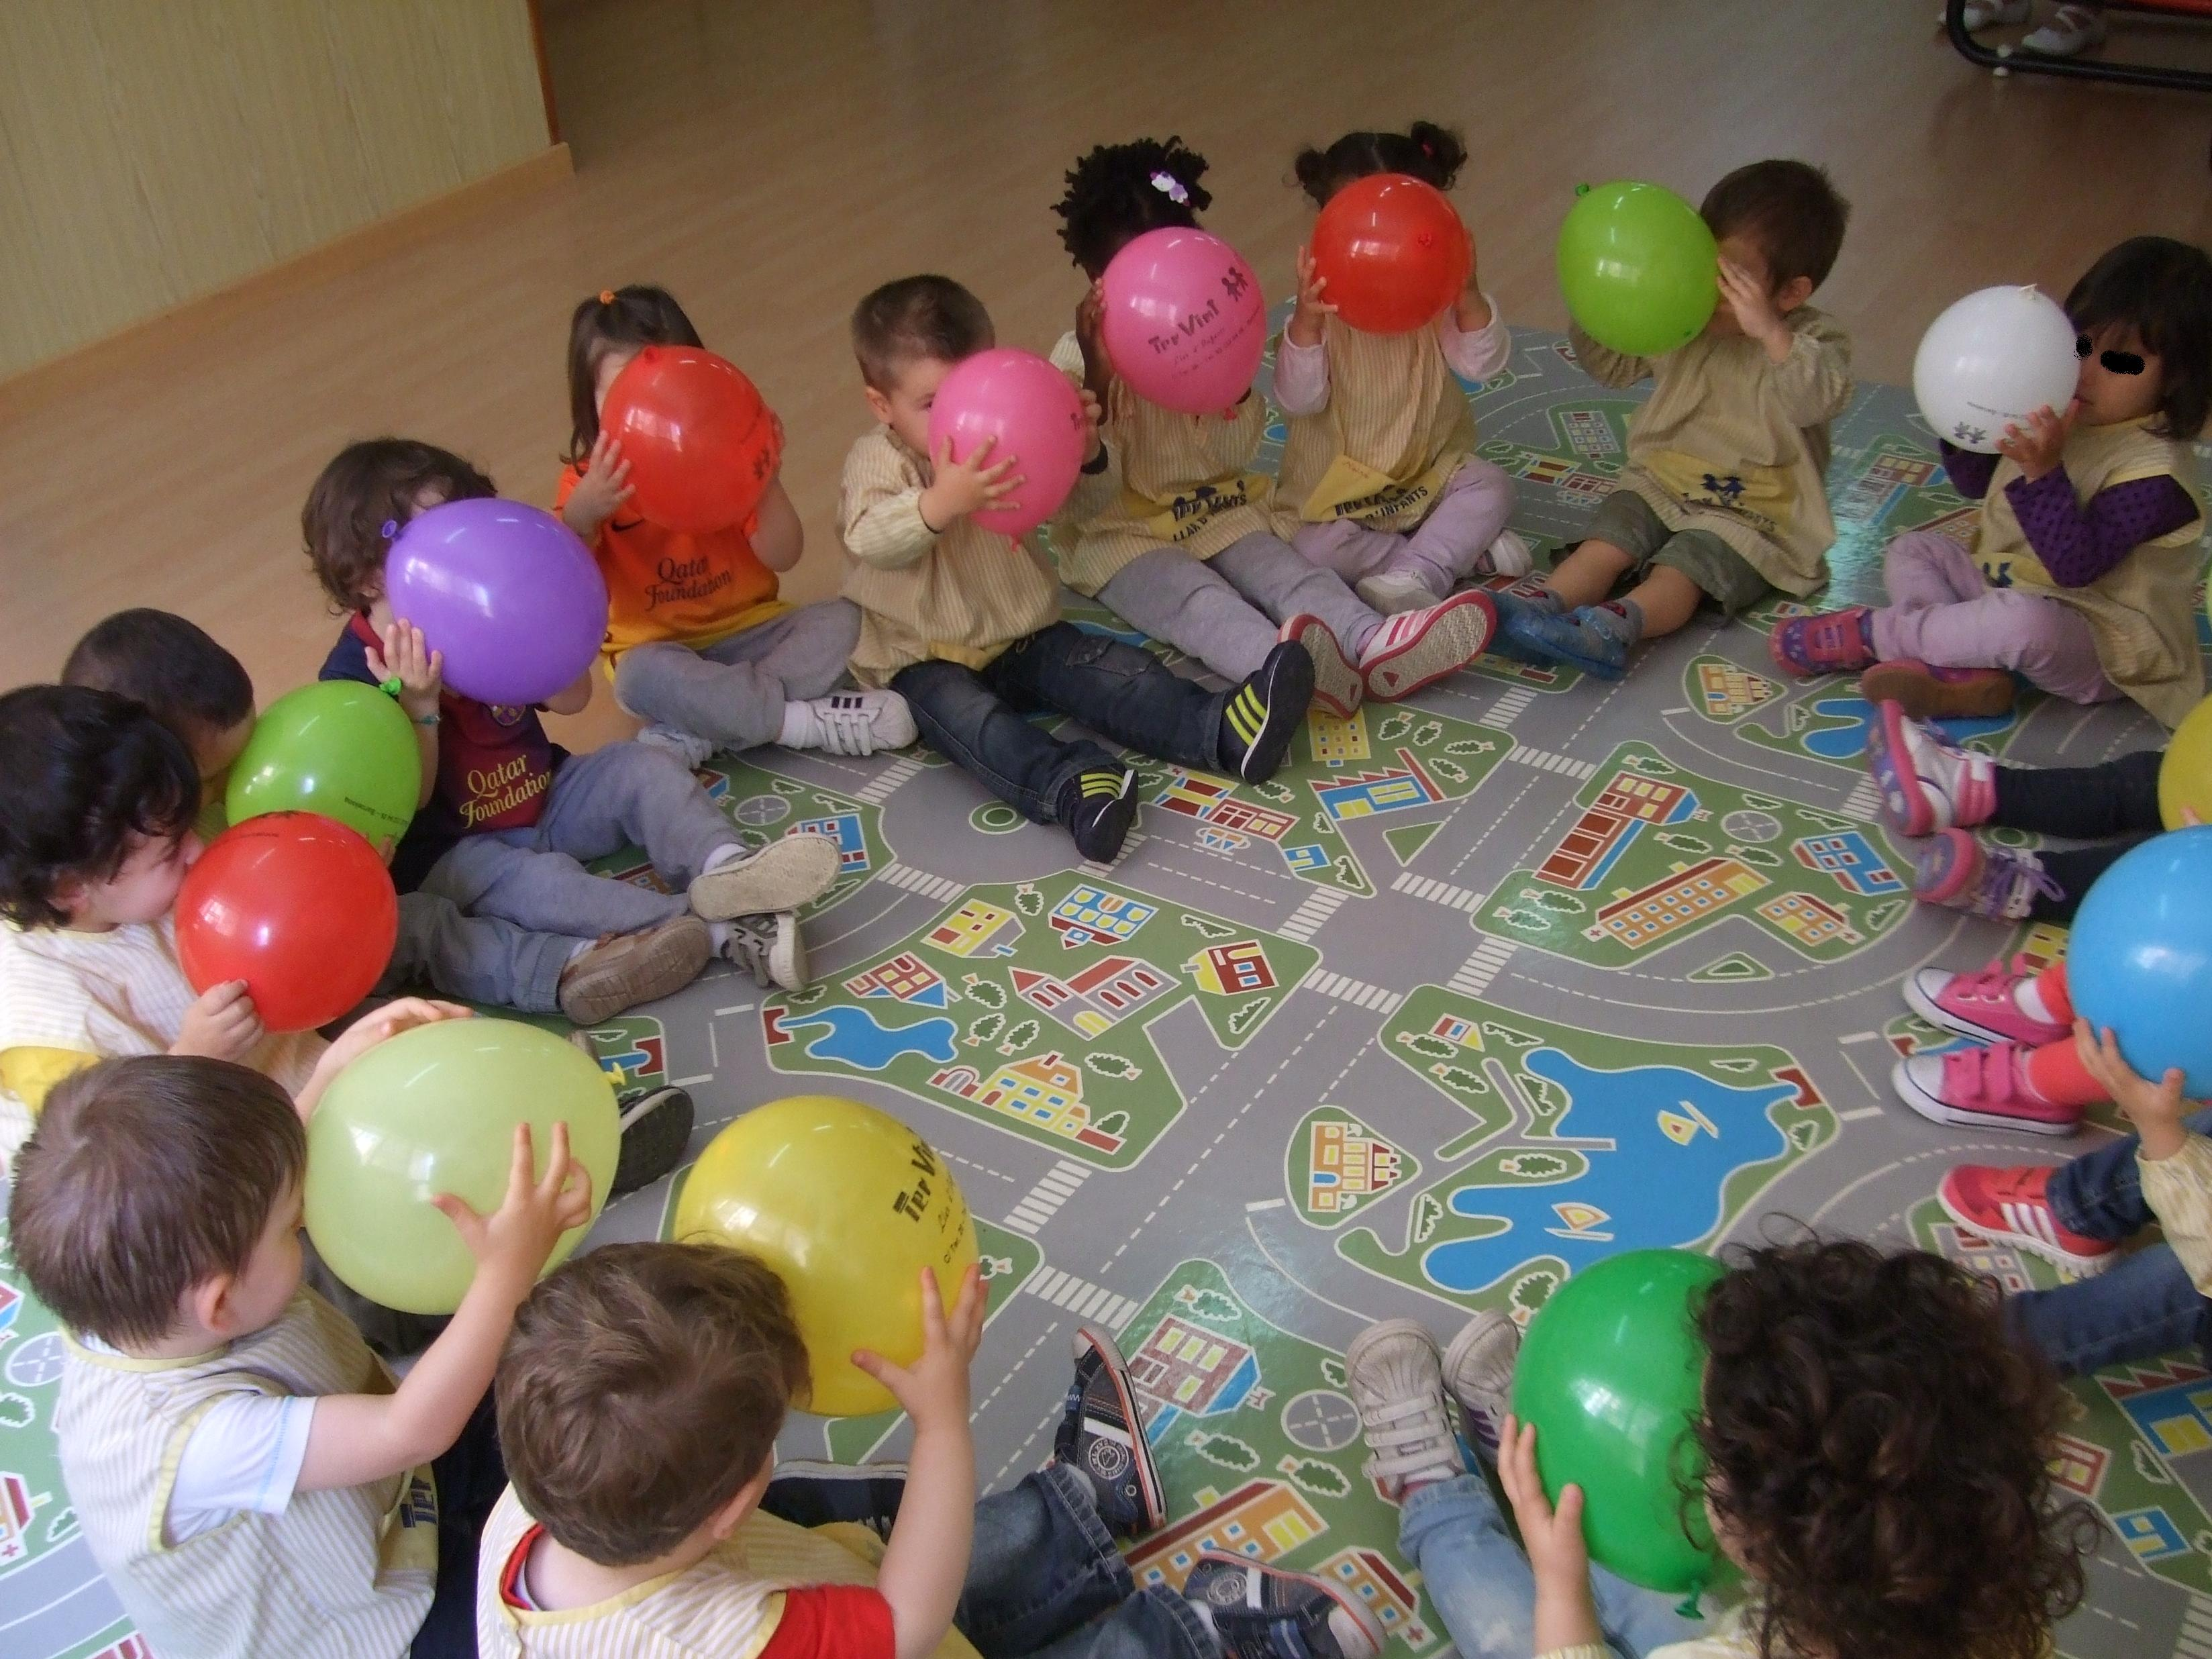 globus i nens.JPG